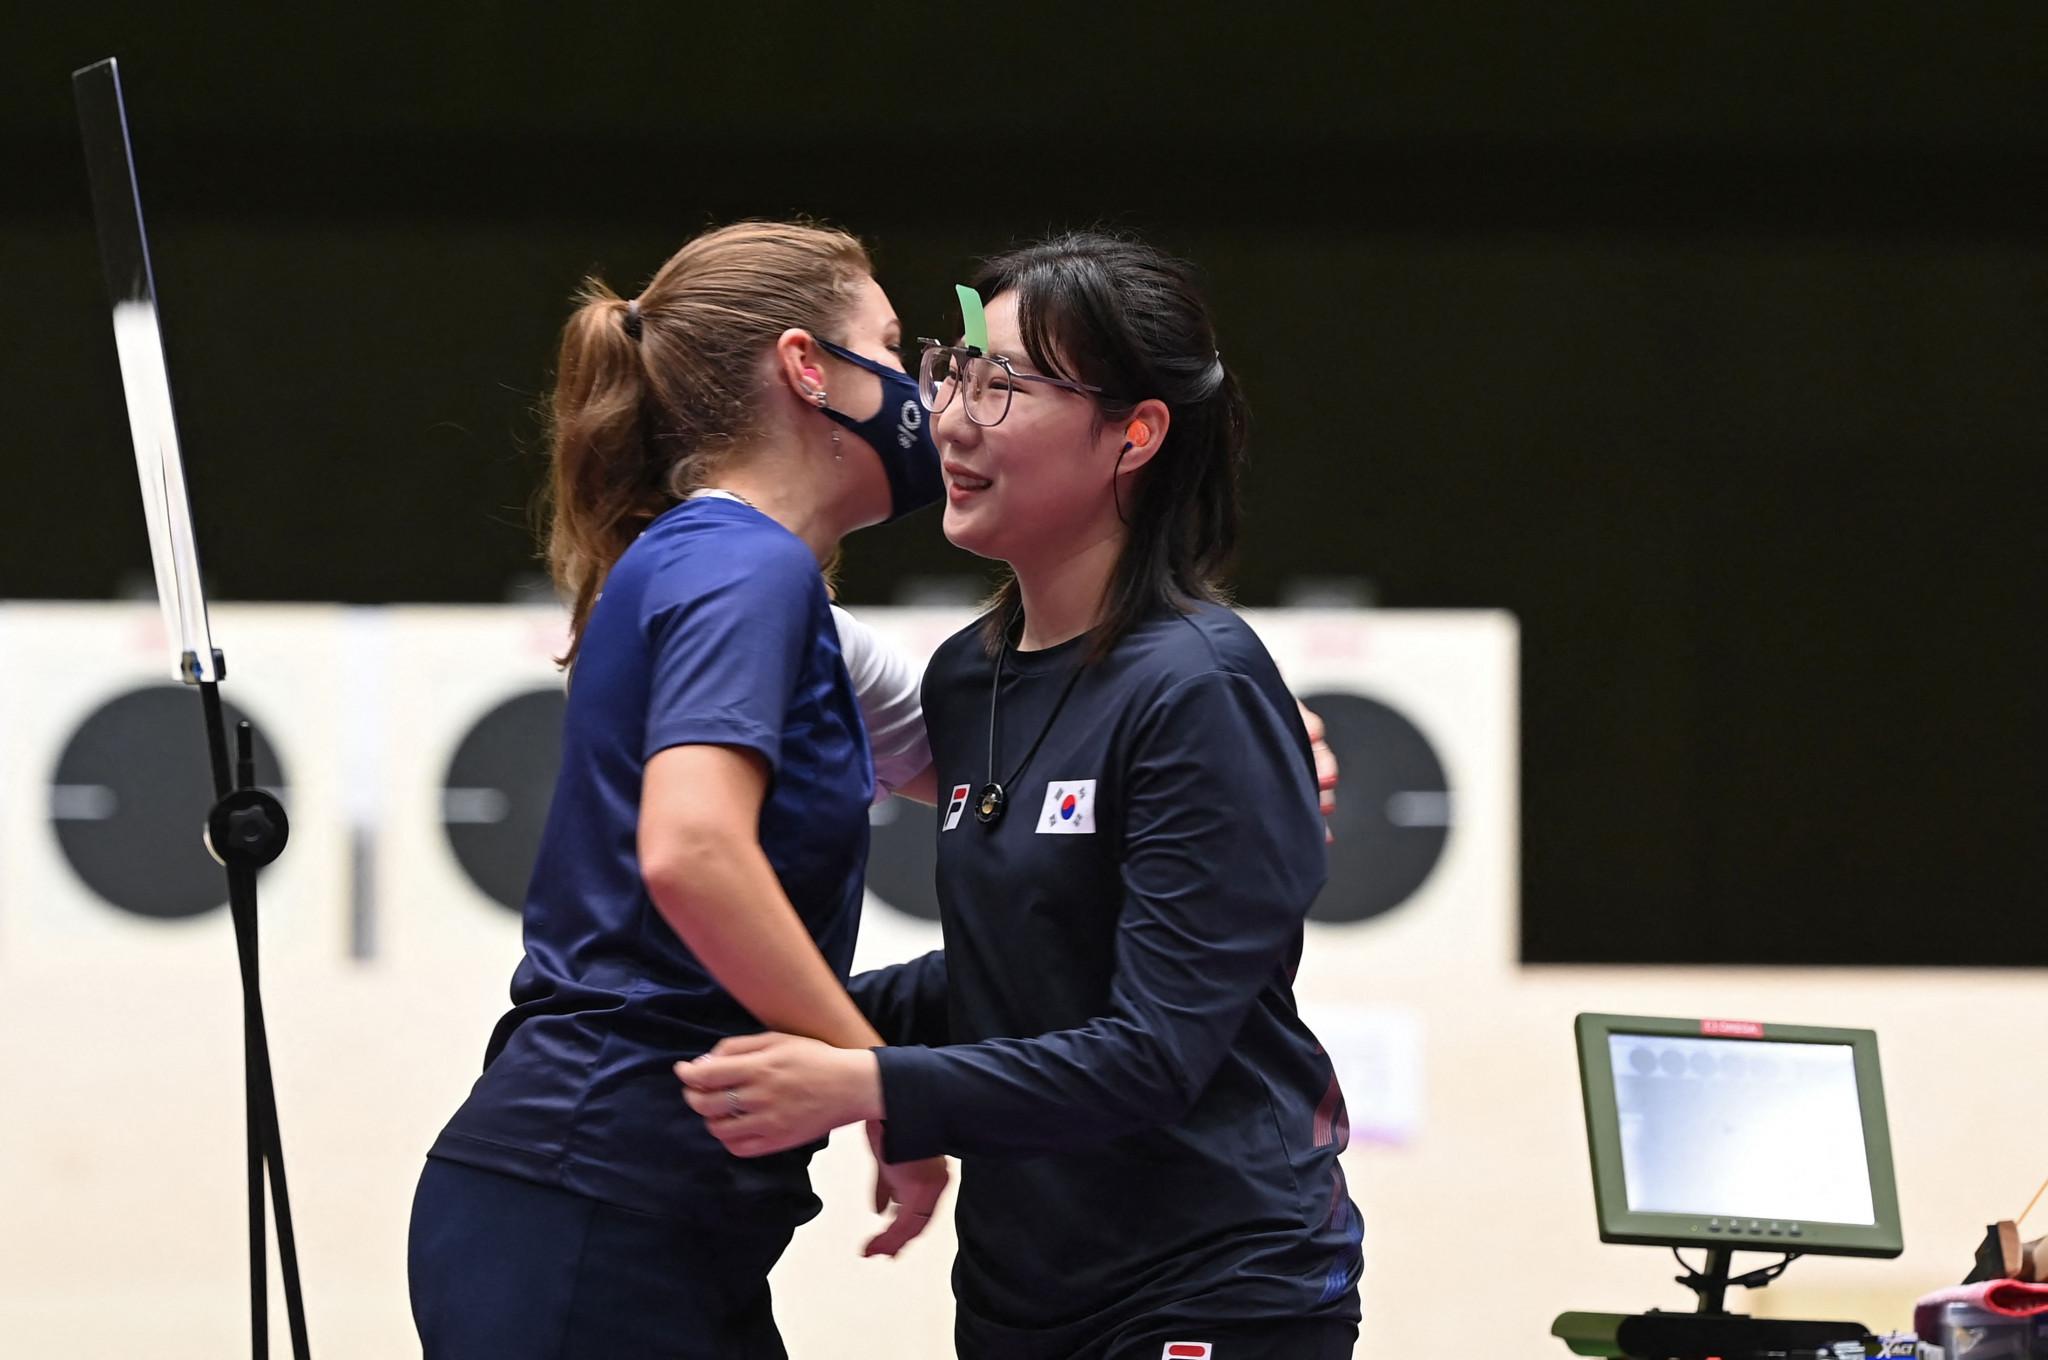 Vitalina Batsarashkina, left, and Kim Minjung both set Olympic records before the ROC athlete won a shoot-off ©Getty Images